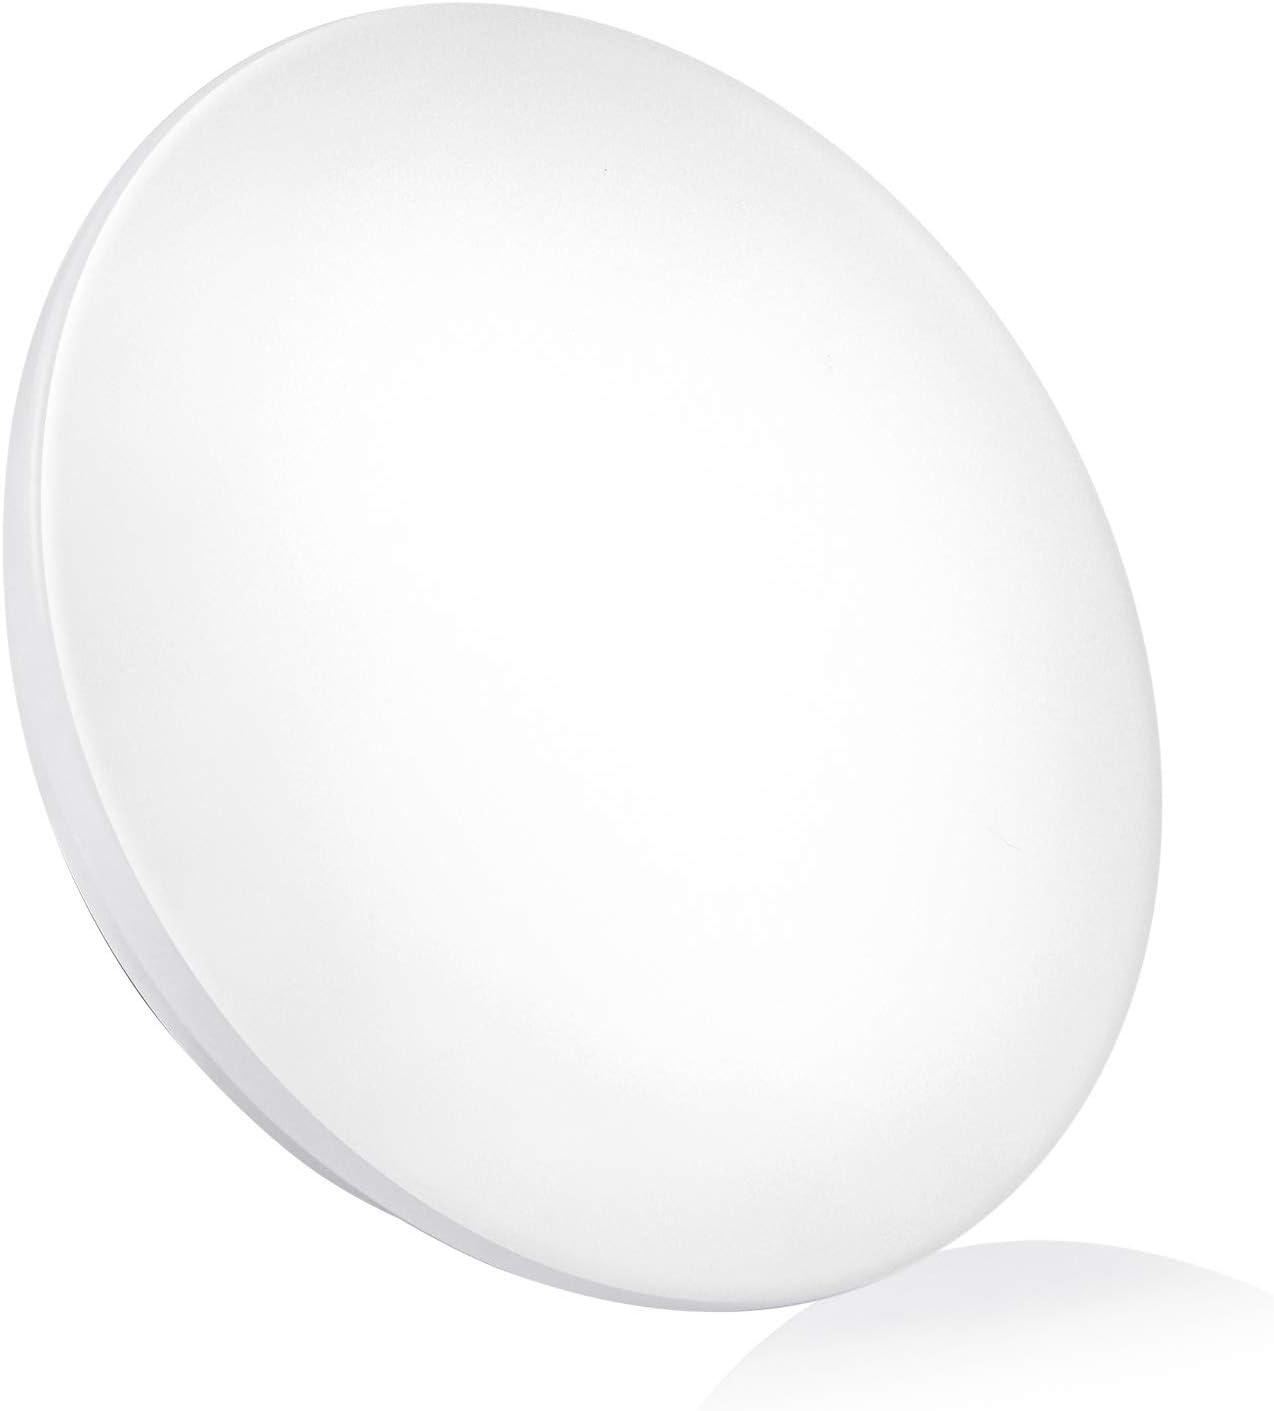 "LED Ceiling Light Flush Mount, 1,350LM 15W Ceiling Lamp, 10"" Round Lighting Fixture, 25,000H Lifetime, Warm White 3,000K Soft White, IP44, CRI90+ for Bedroom, Kitchen, Bathroom, Hallway by BRILLIRARE"